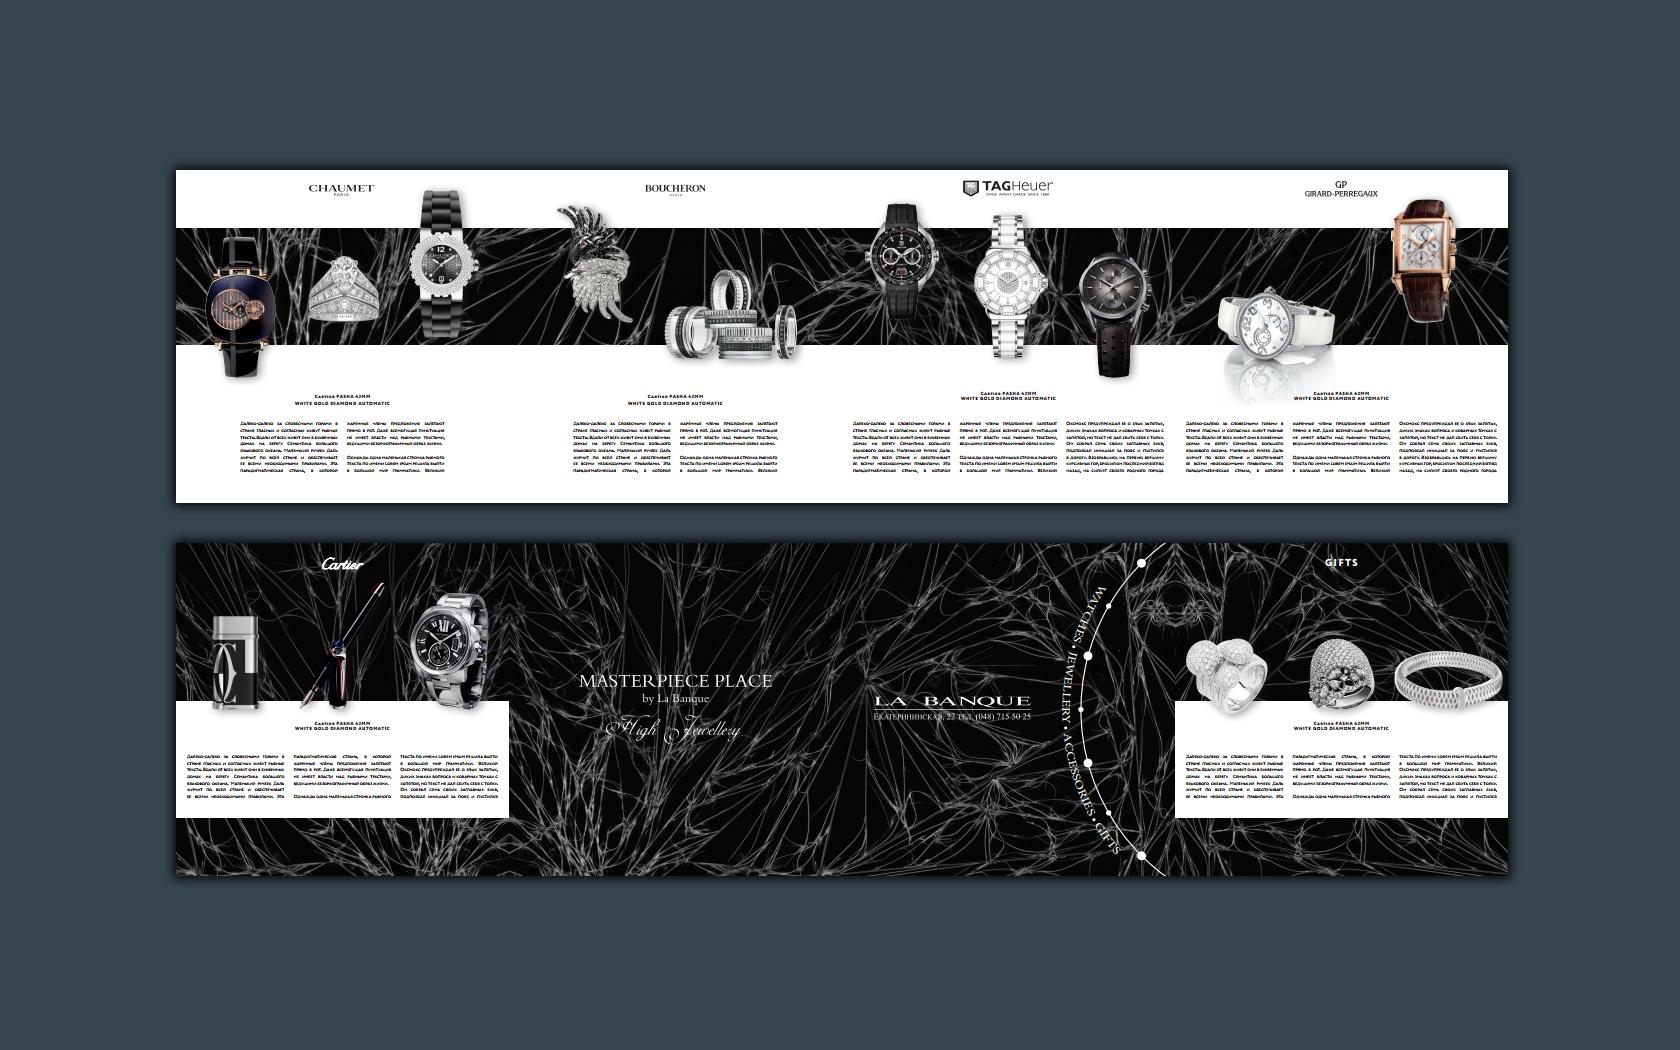 Раскладушка для сети бутиков luxury сегмента.